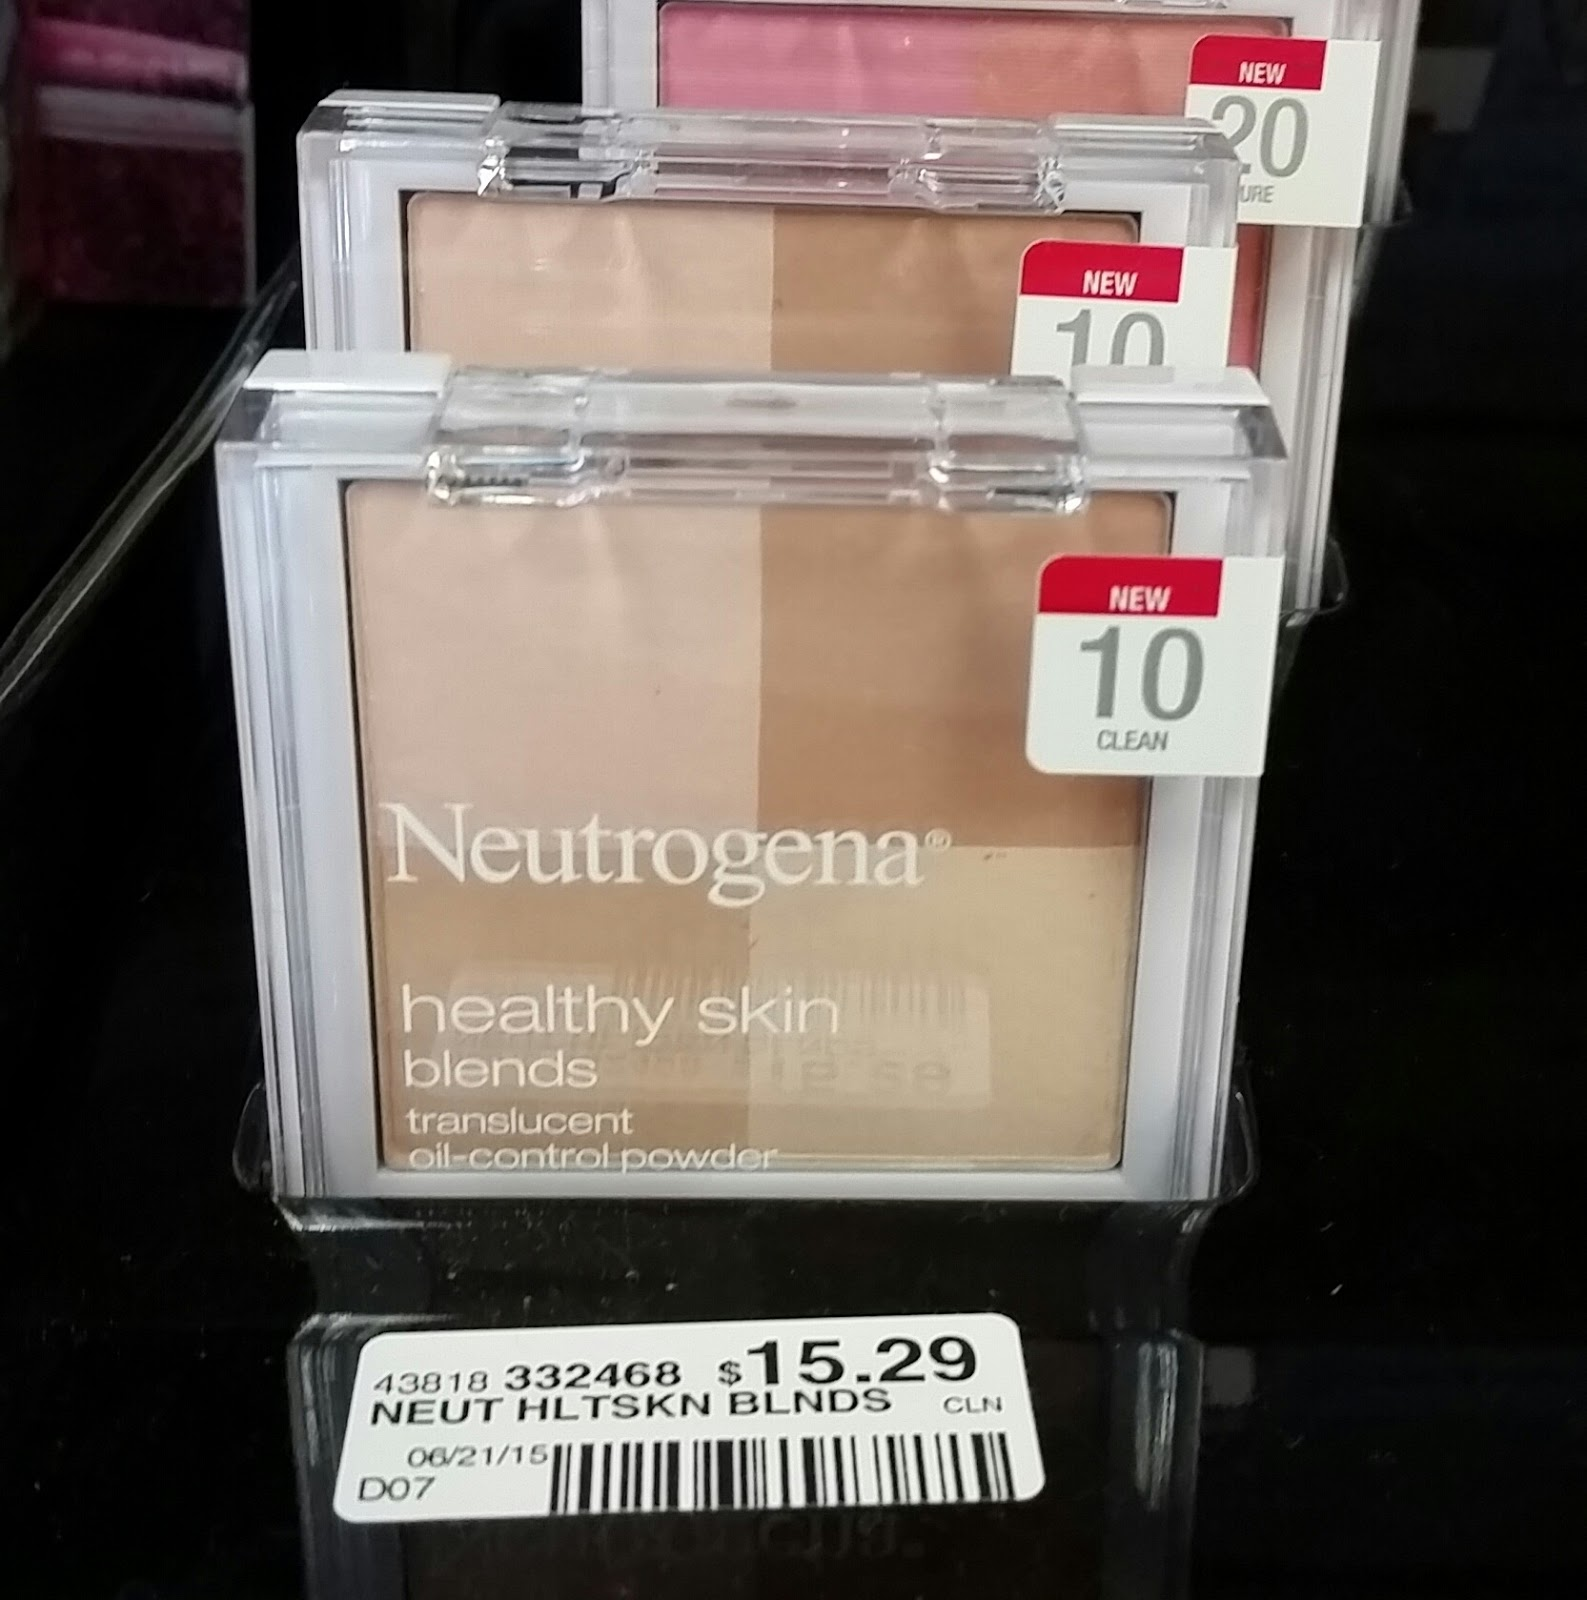 Neutrogena healthy skin blends clean